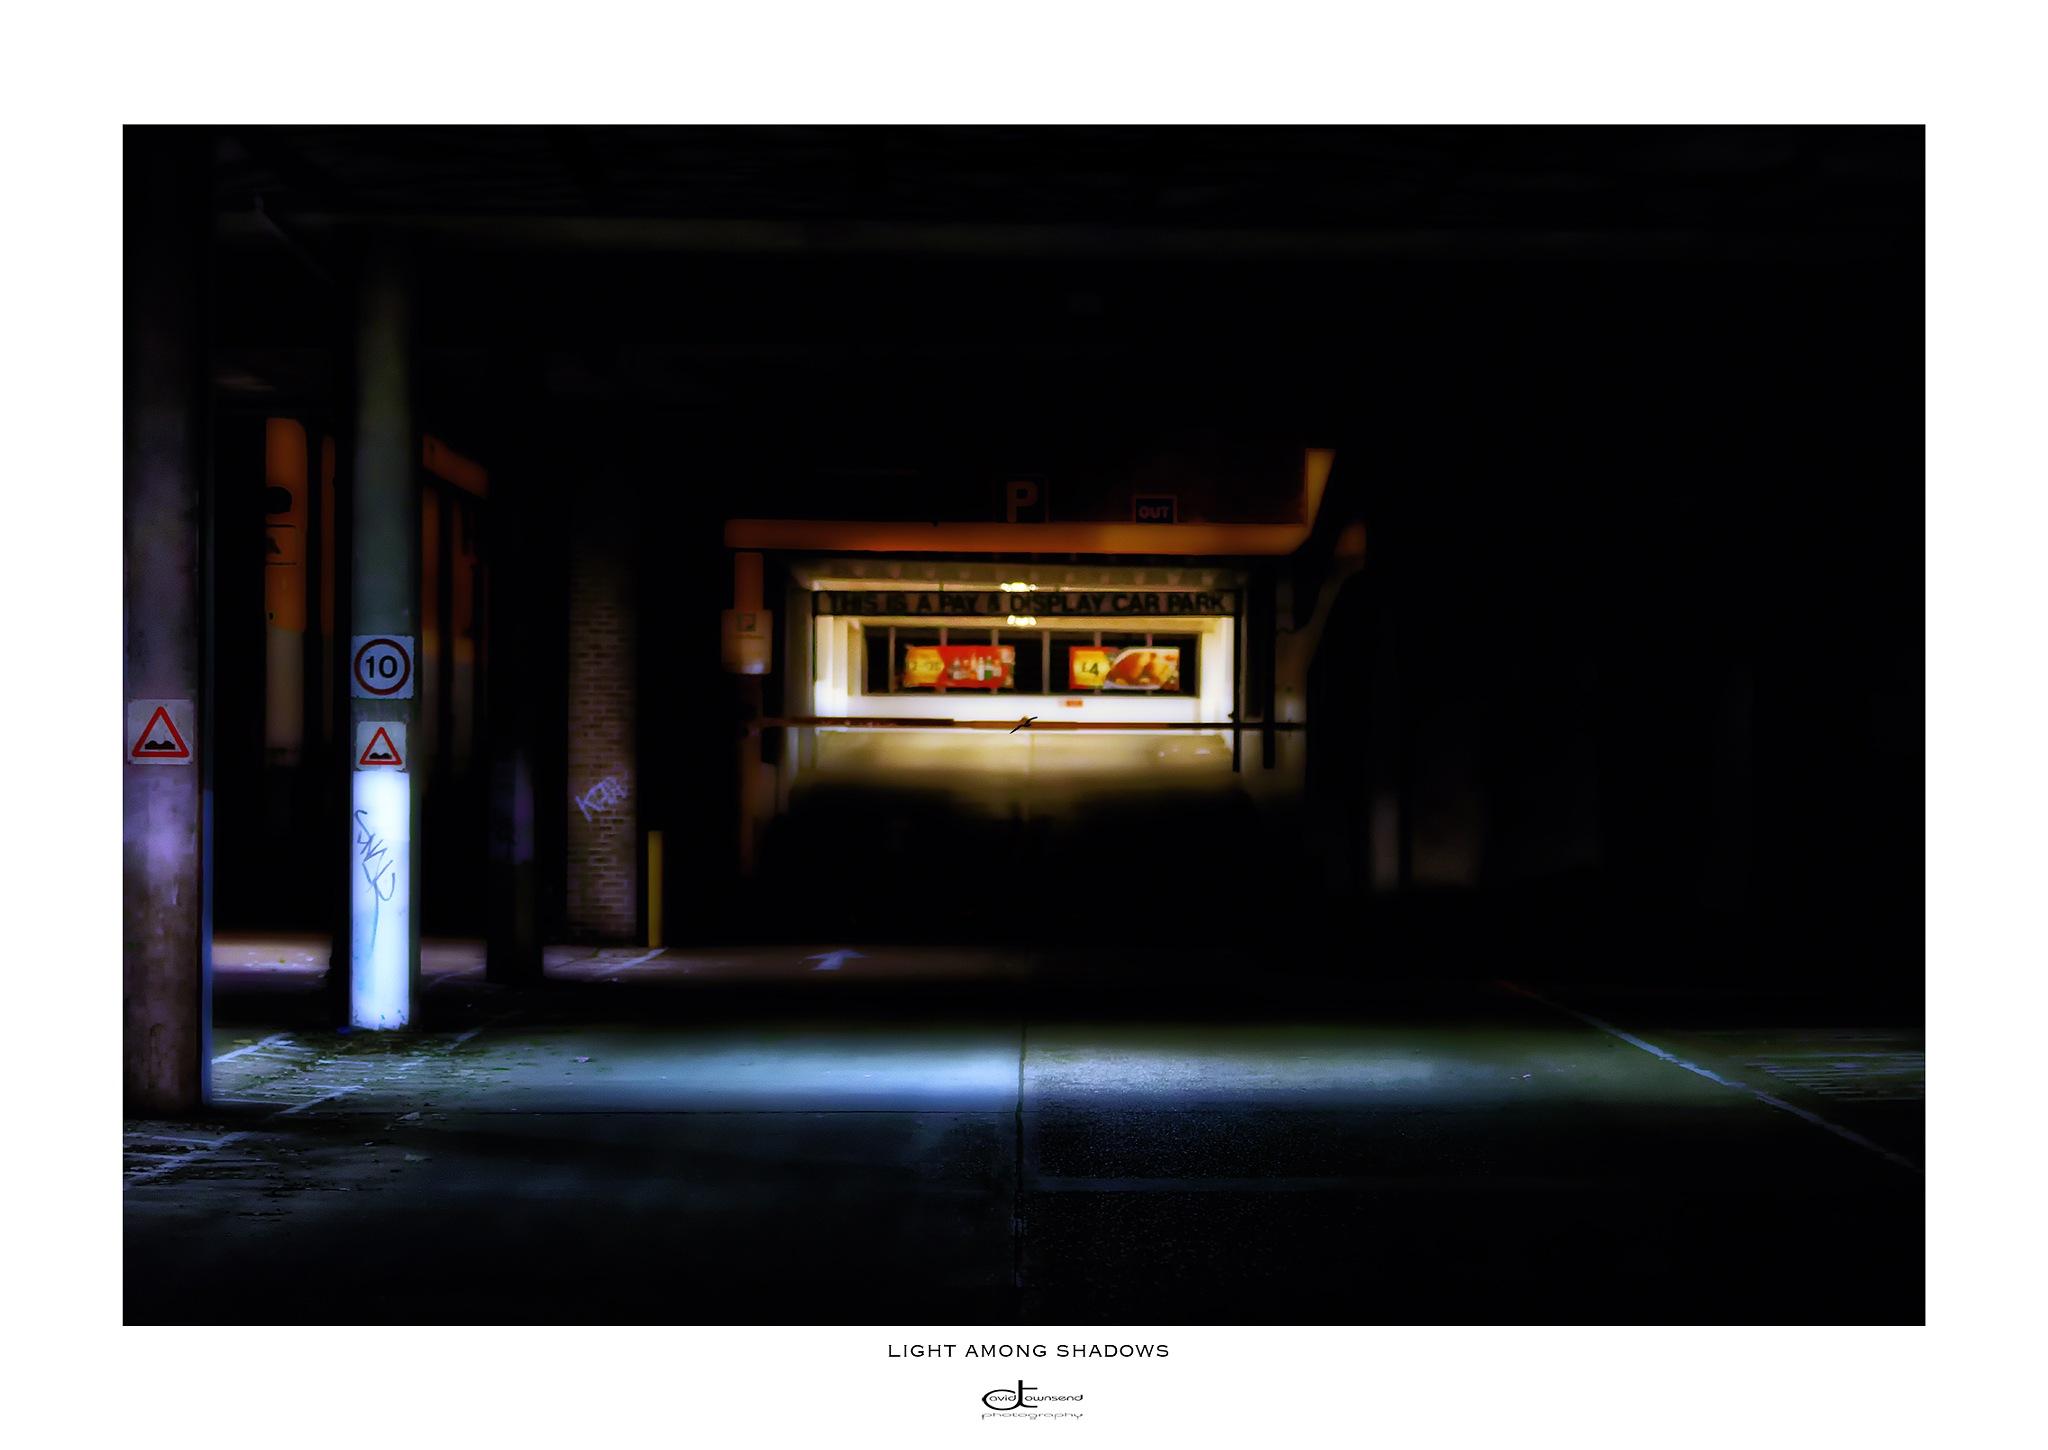 Light among shadows by David Townsend